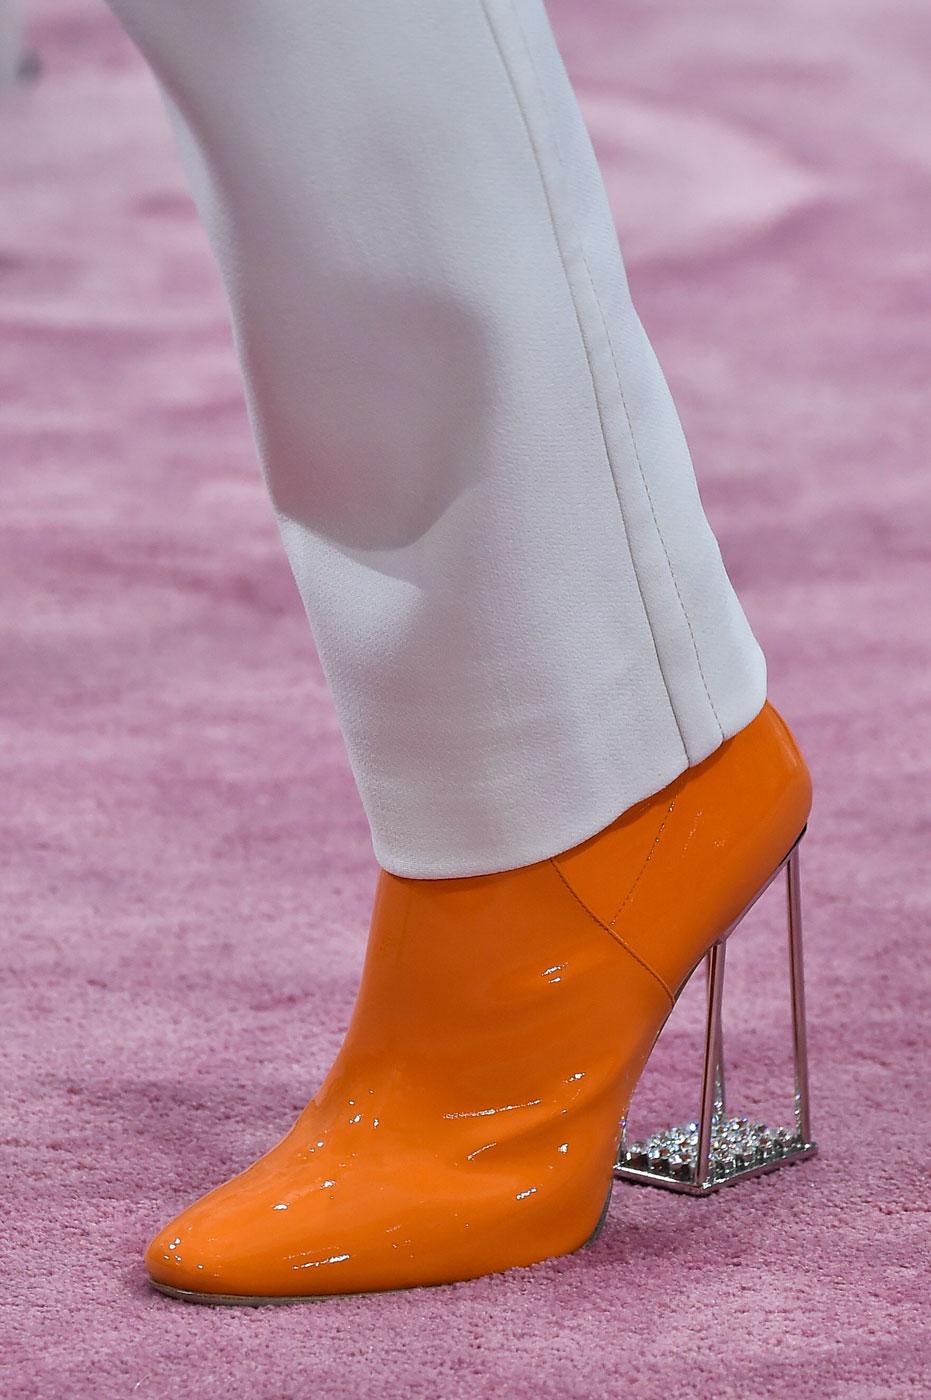 Christian-Dior-fashion-runway-show-close-ups-haute-couture-paris-spring-summer-2015-the-impression-181